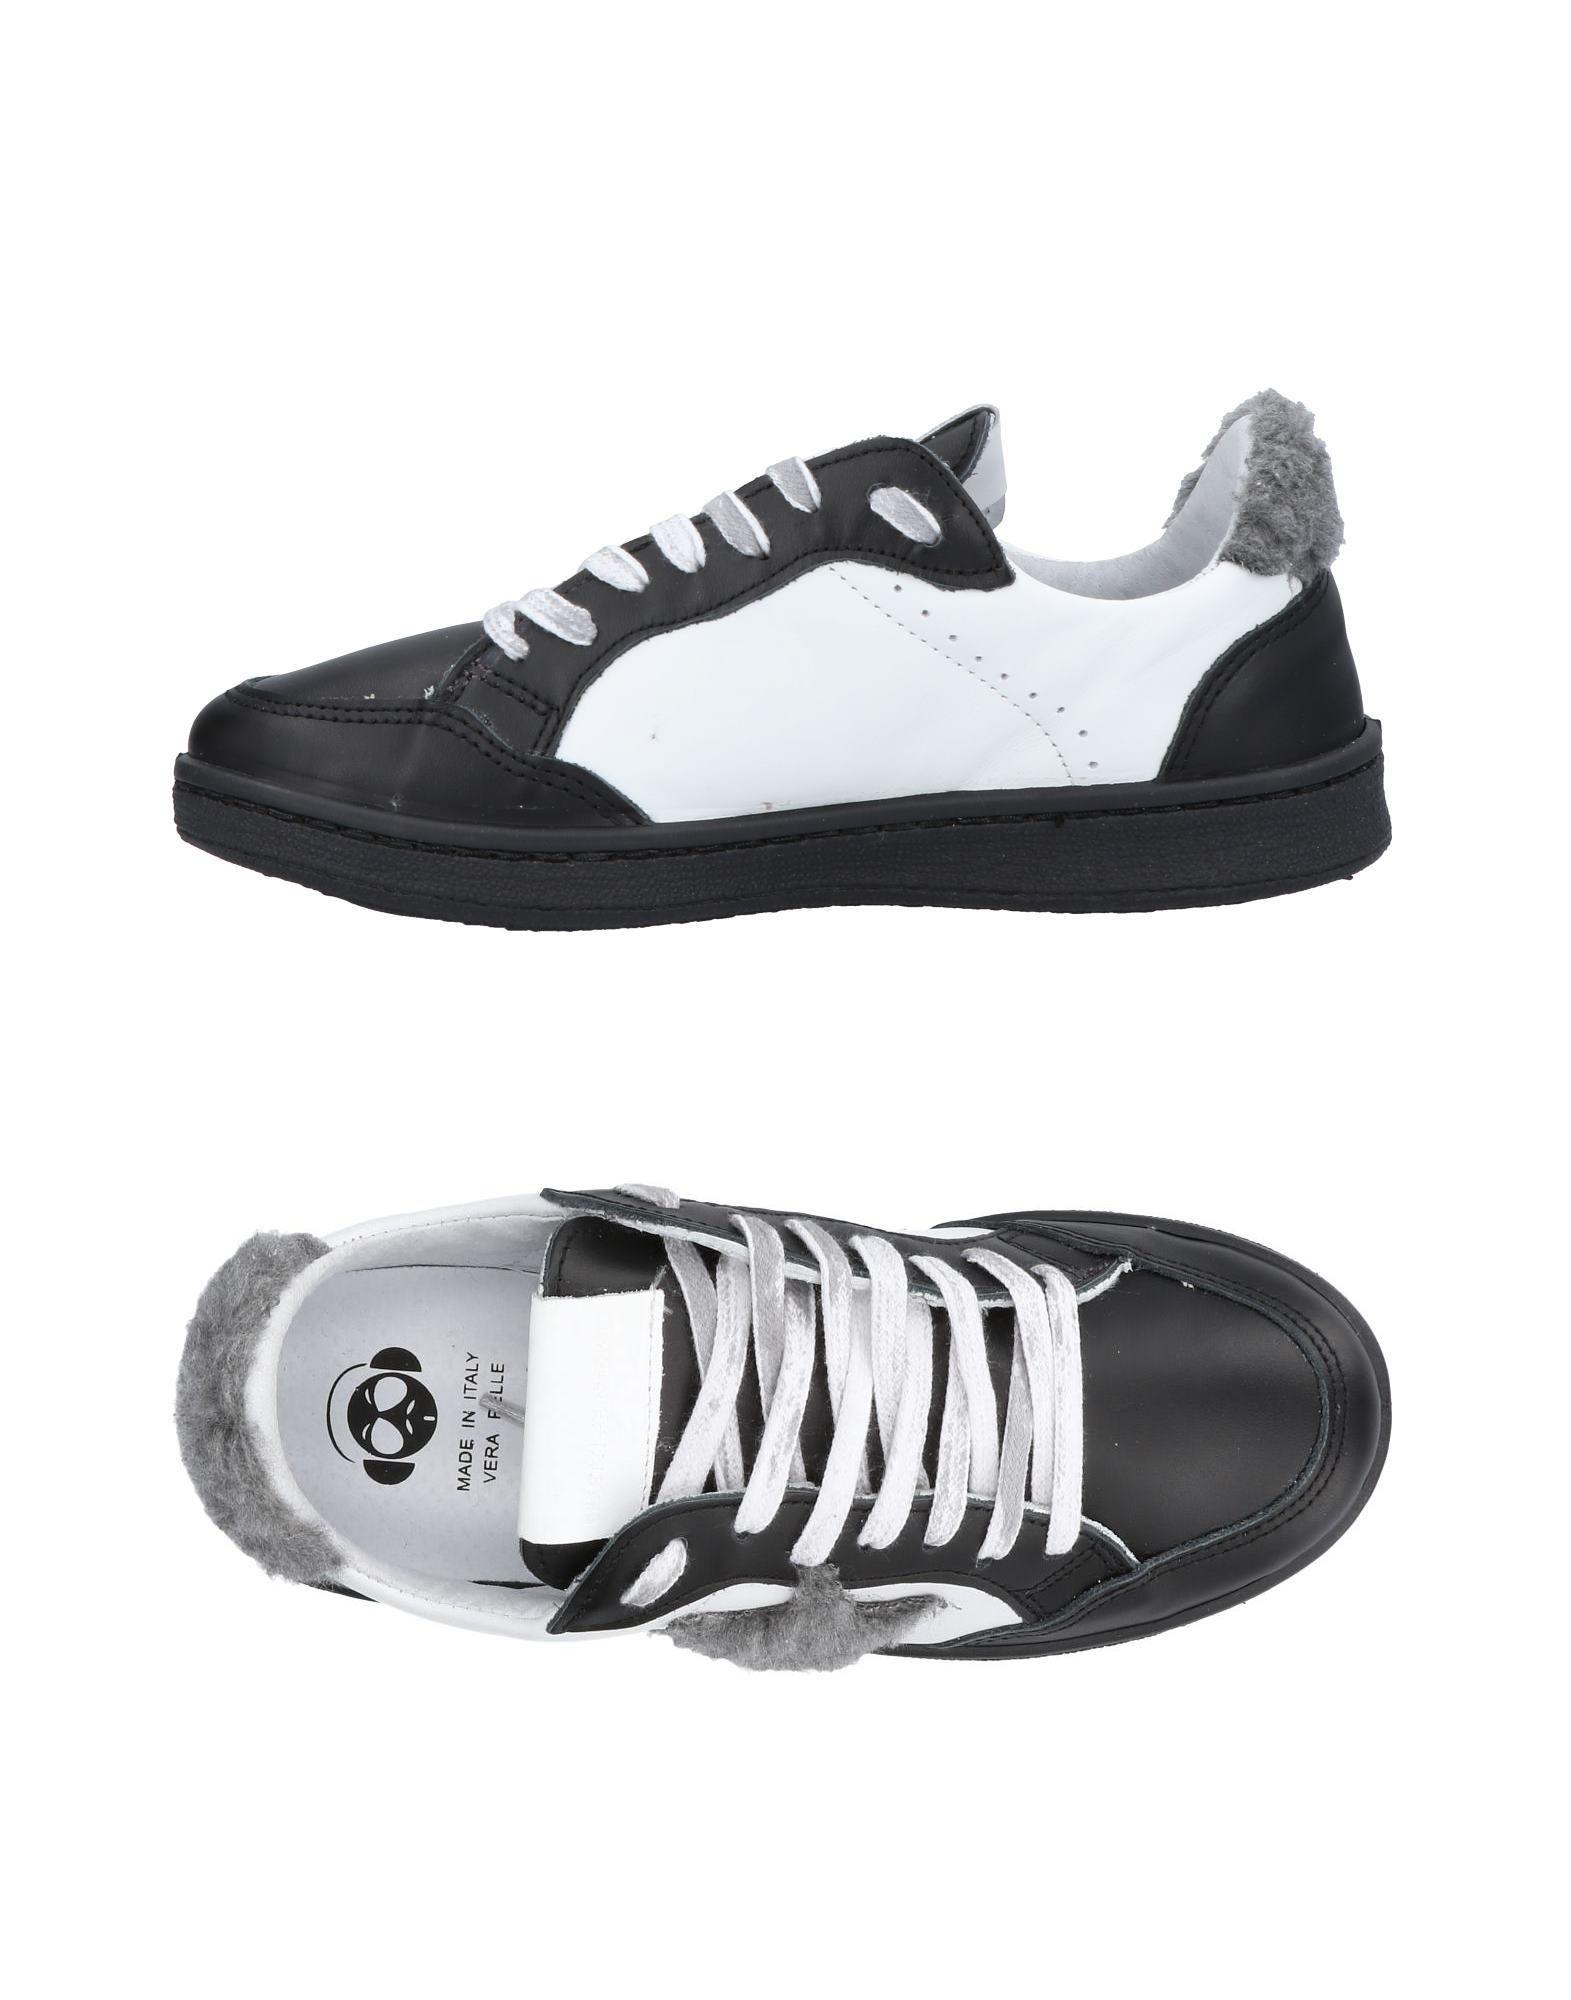 Effetti Personali Sneakers Damen  11467912JA